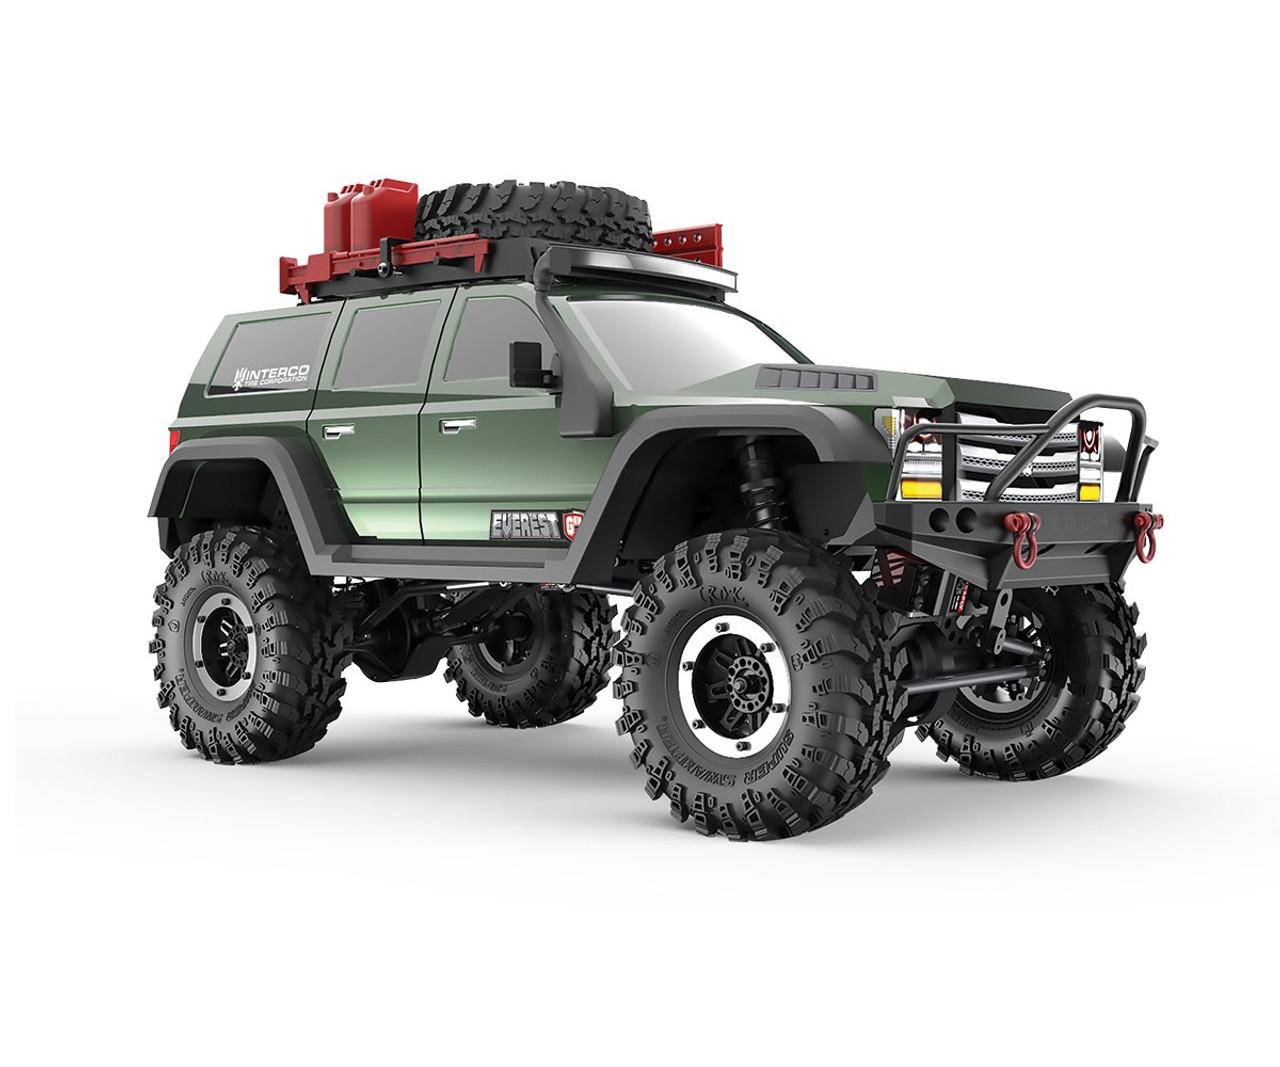 Rc Trucks Green : Everest gen pro rc monster truck electric ghz